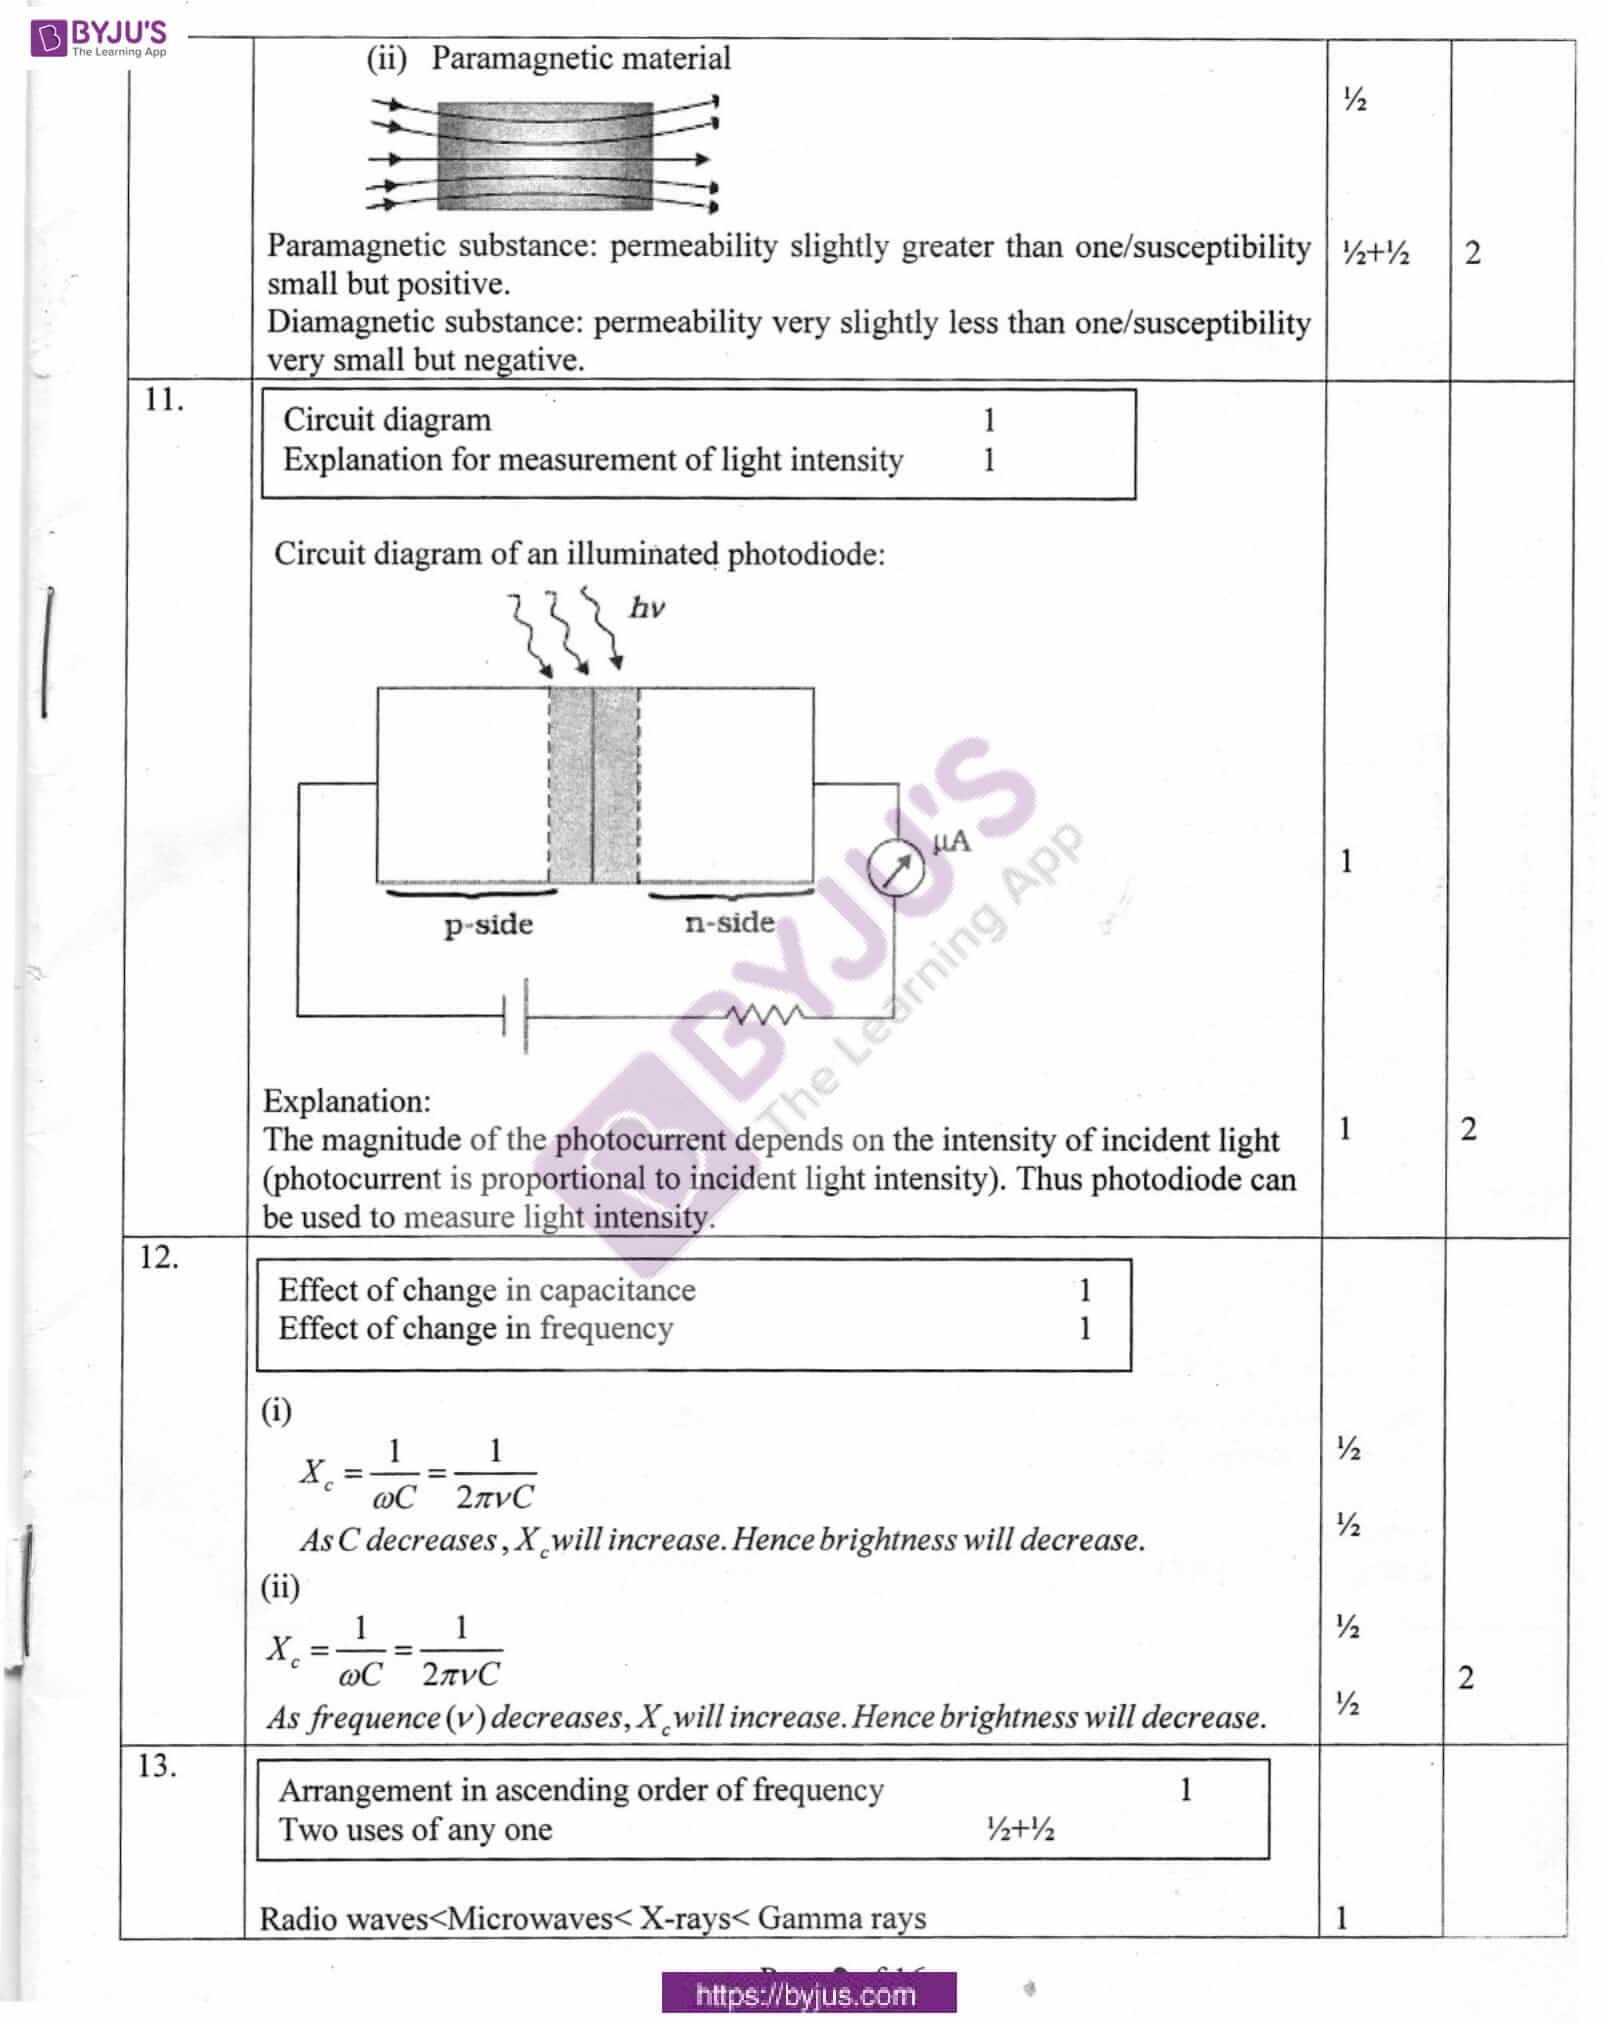 cbse class 12 physics solution 2010 set 1